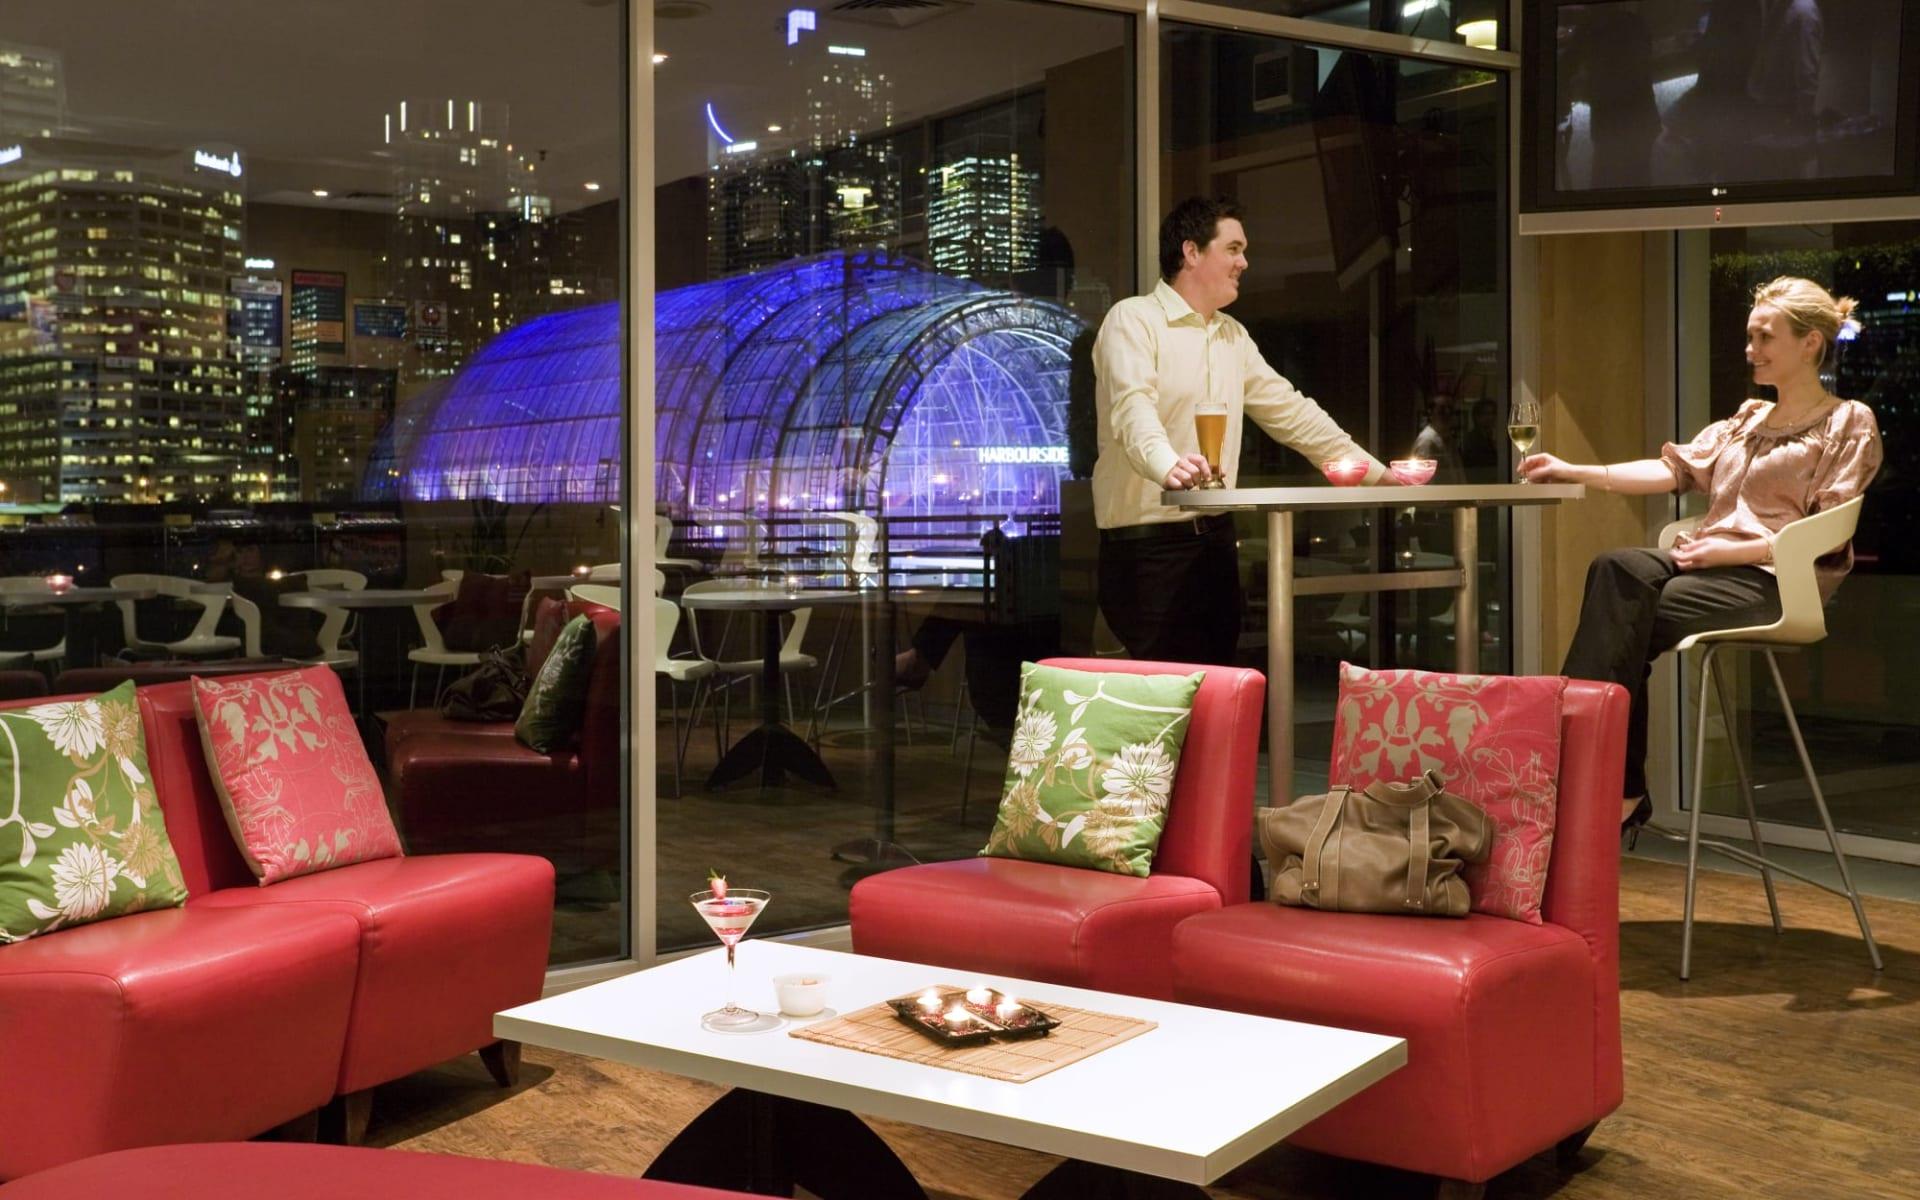 Ibis Sydney Darling Harbour: Facilities Ibis Sydney Darling Harbour Hotel Bar